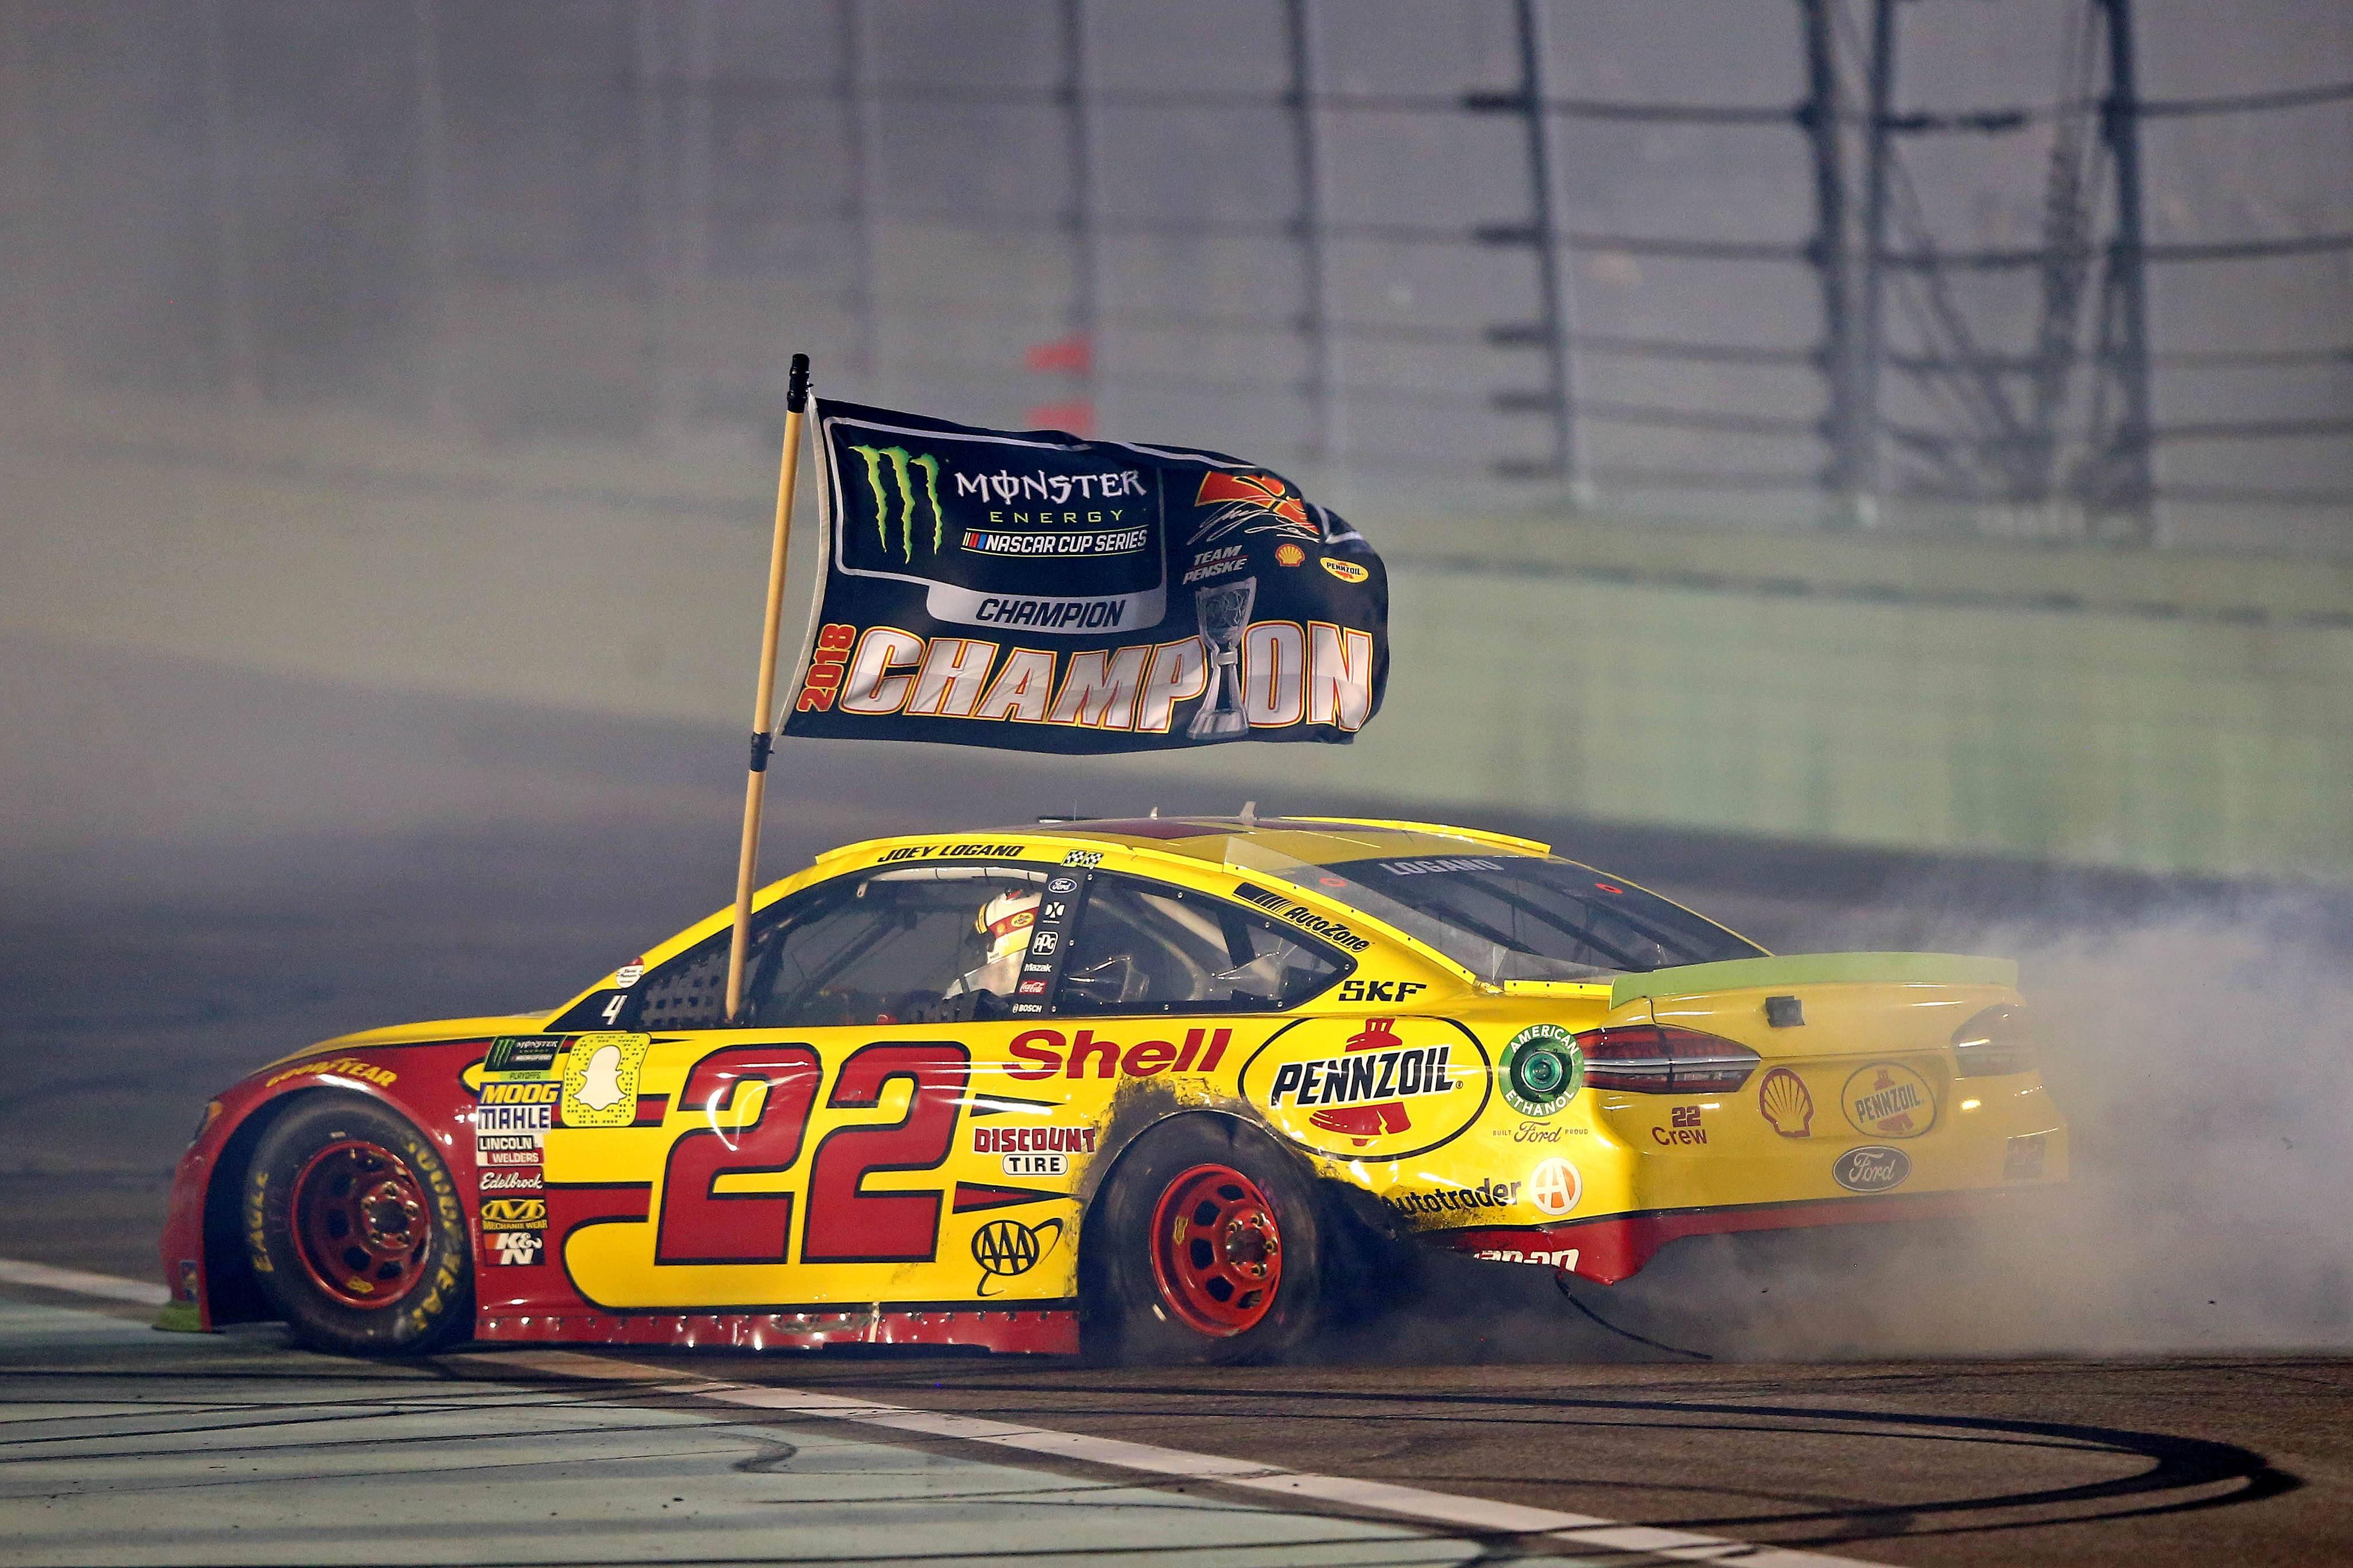 Joey Logano NASCAR championship